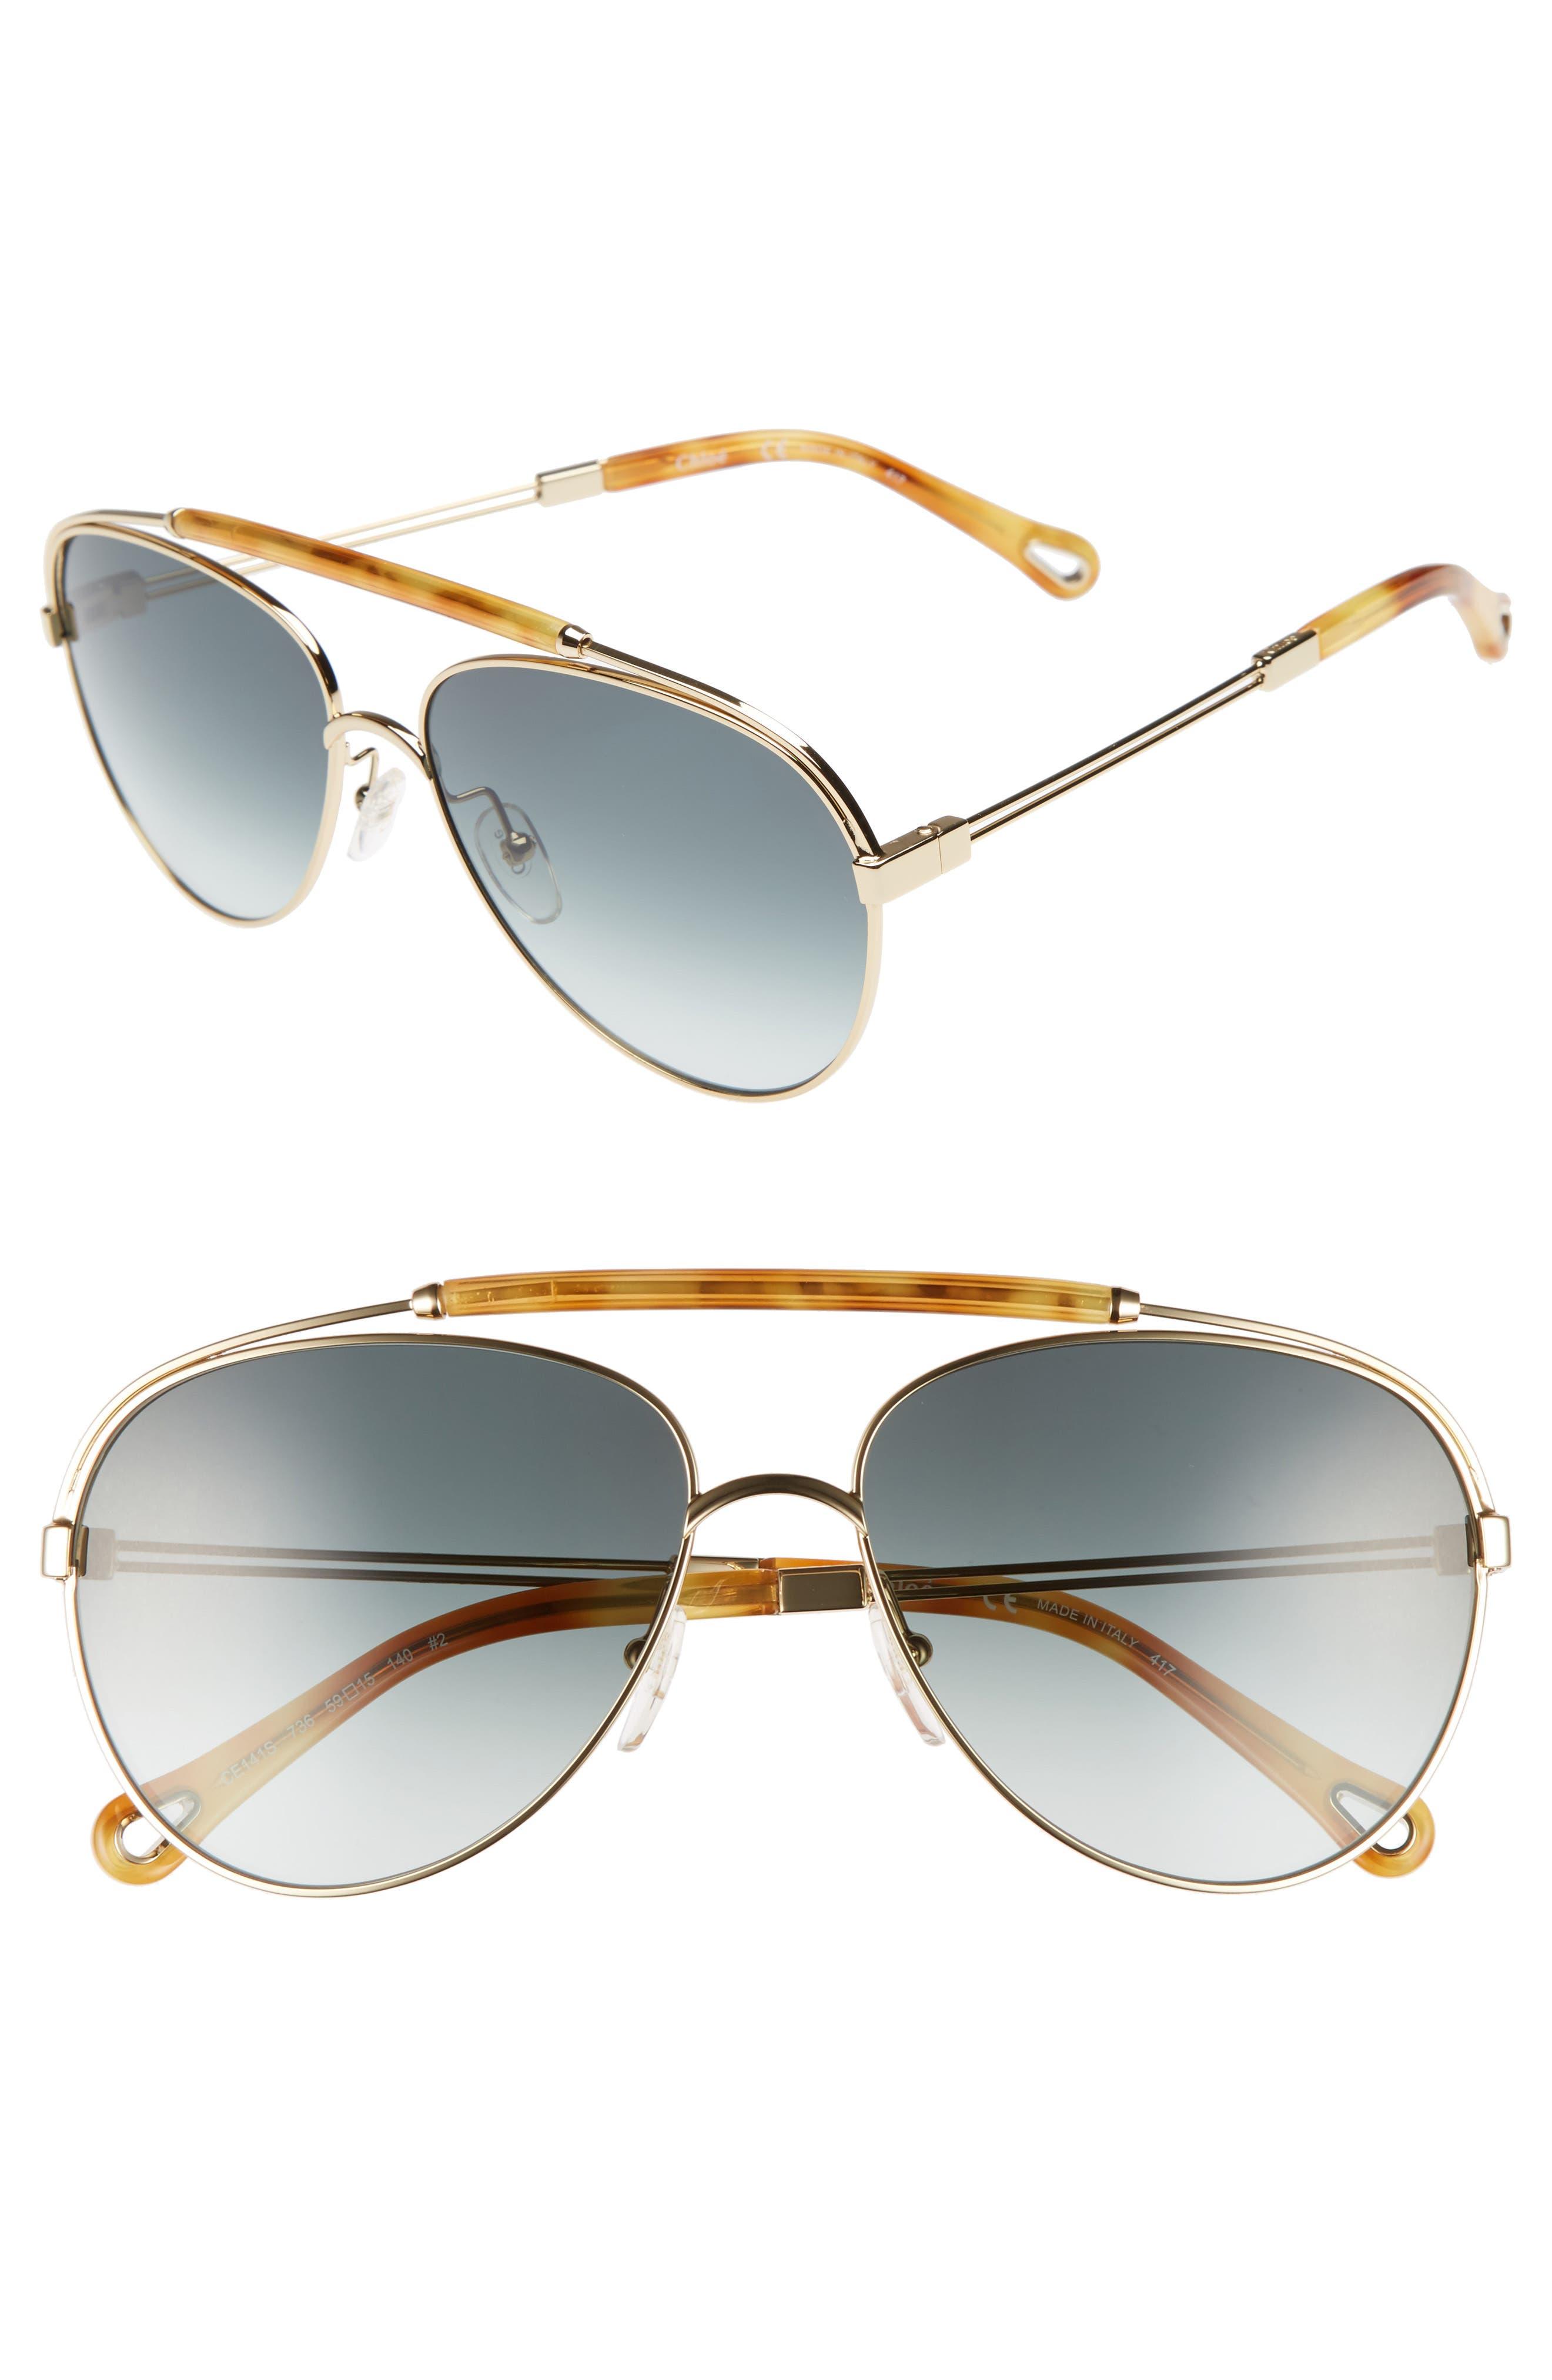 Jackie 59mm Aviator Sunglasses,                             Main thumbnail 1, color,                             GOLD/ BLONDE HAVANA